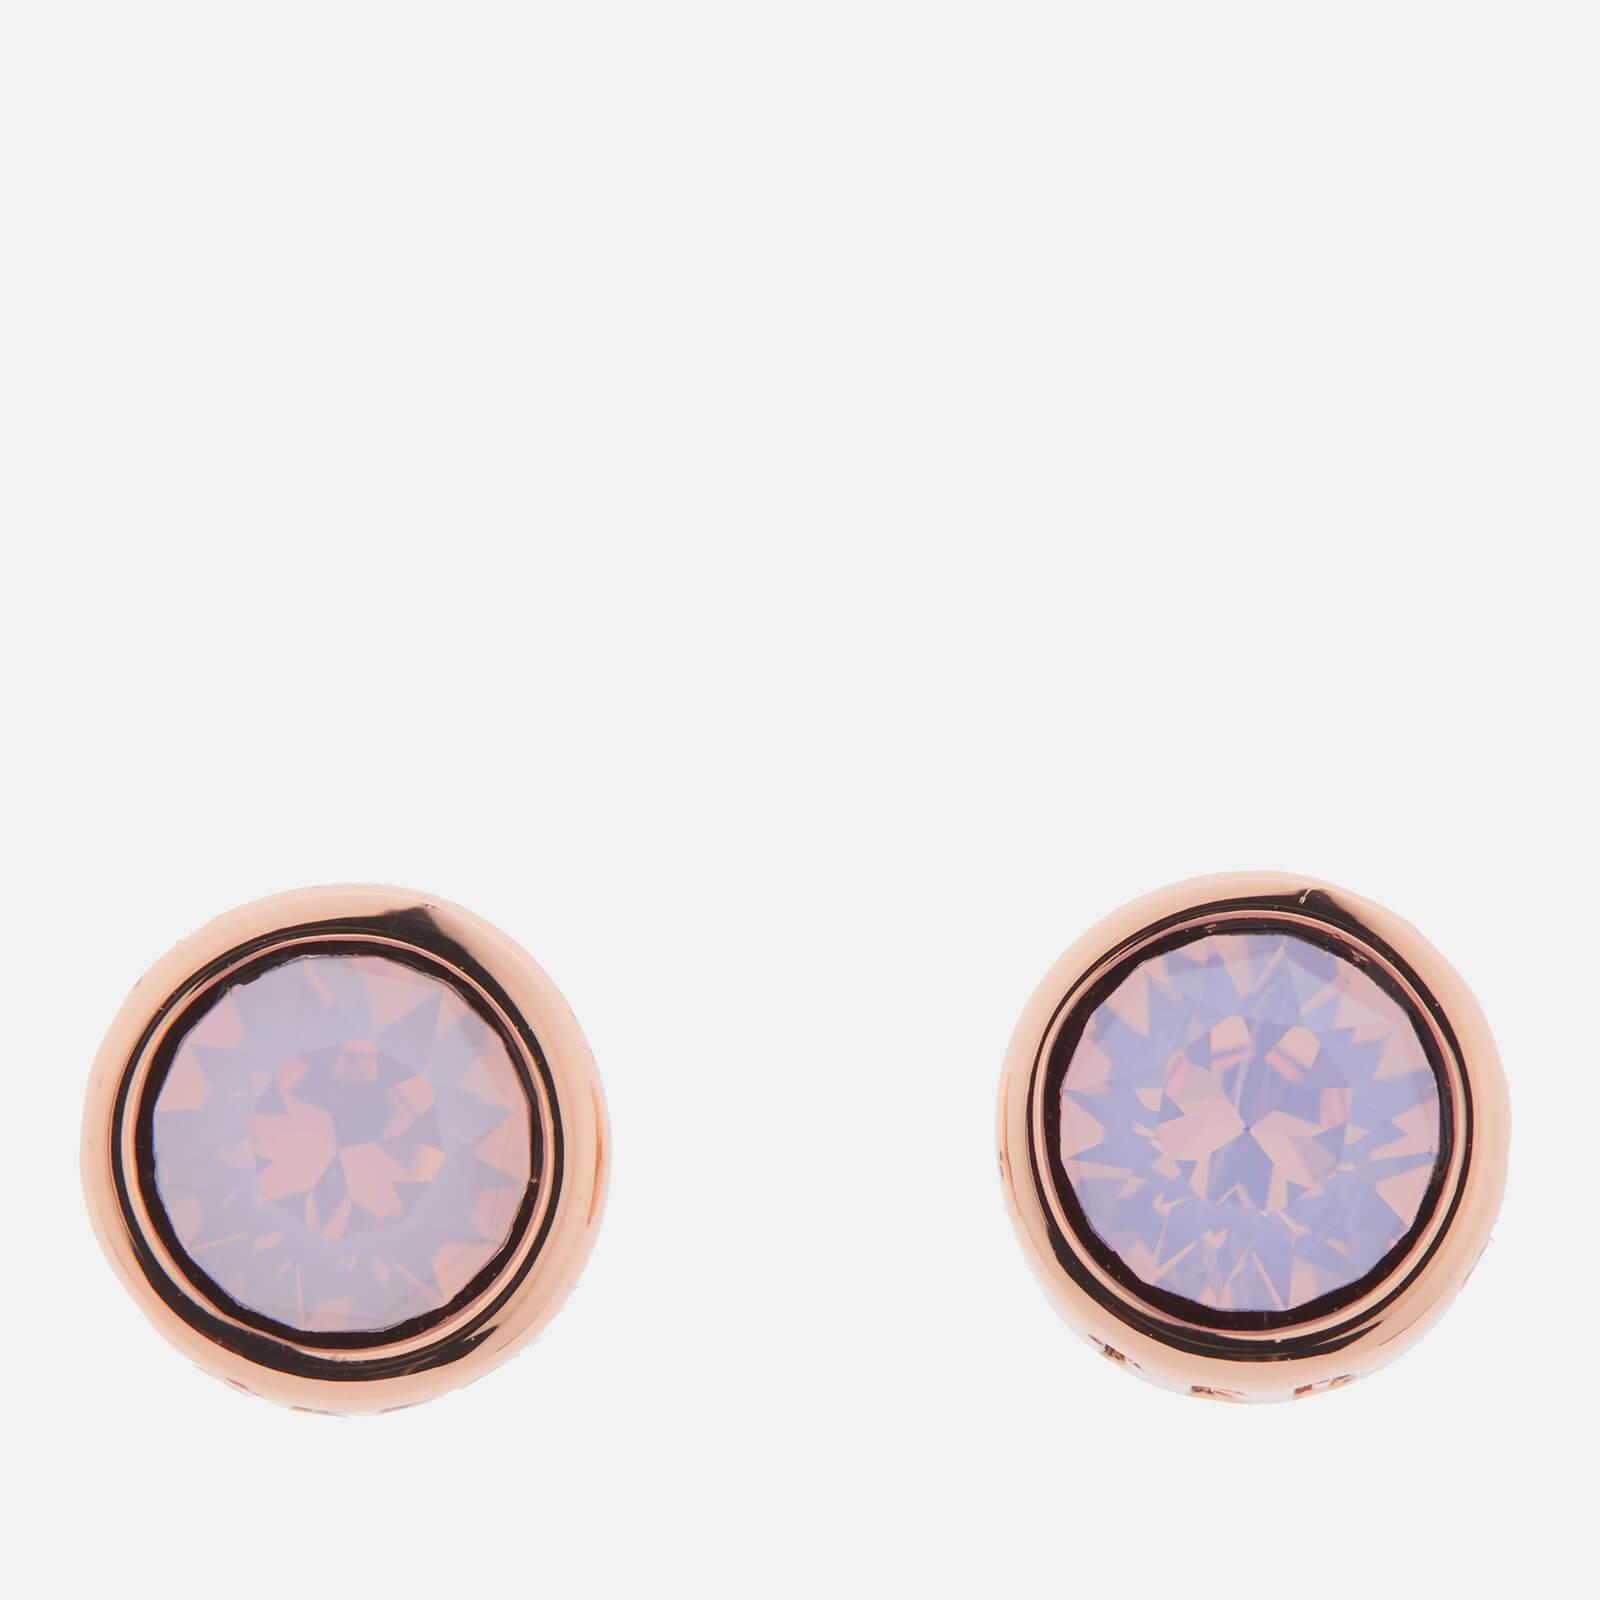 a280d91a1 ... Ted Baker Women's Sinaa Swarovski Crystal Stud Earrings - Rose Gold/Rose  Water Opal -